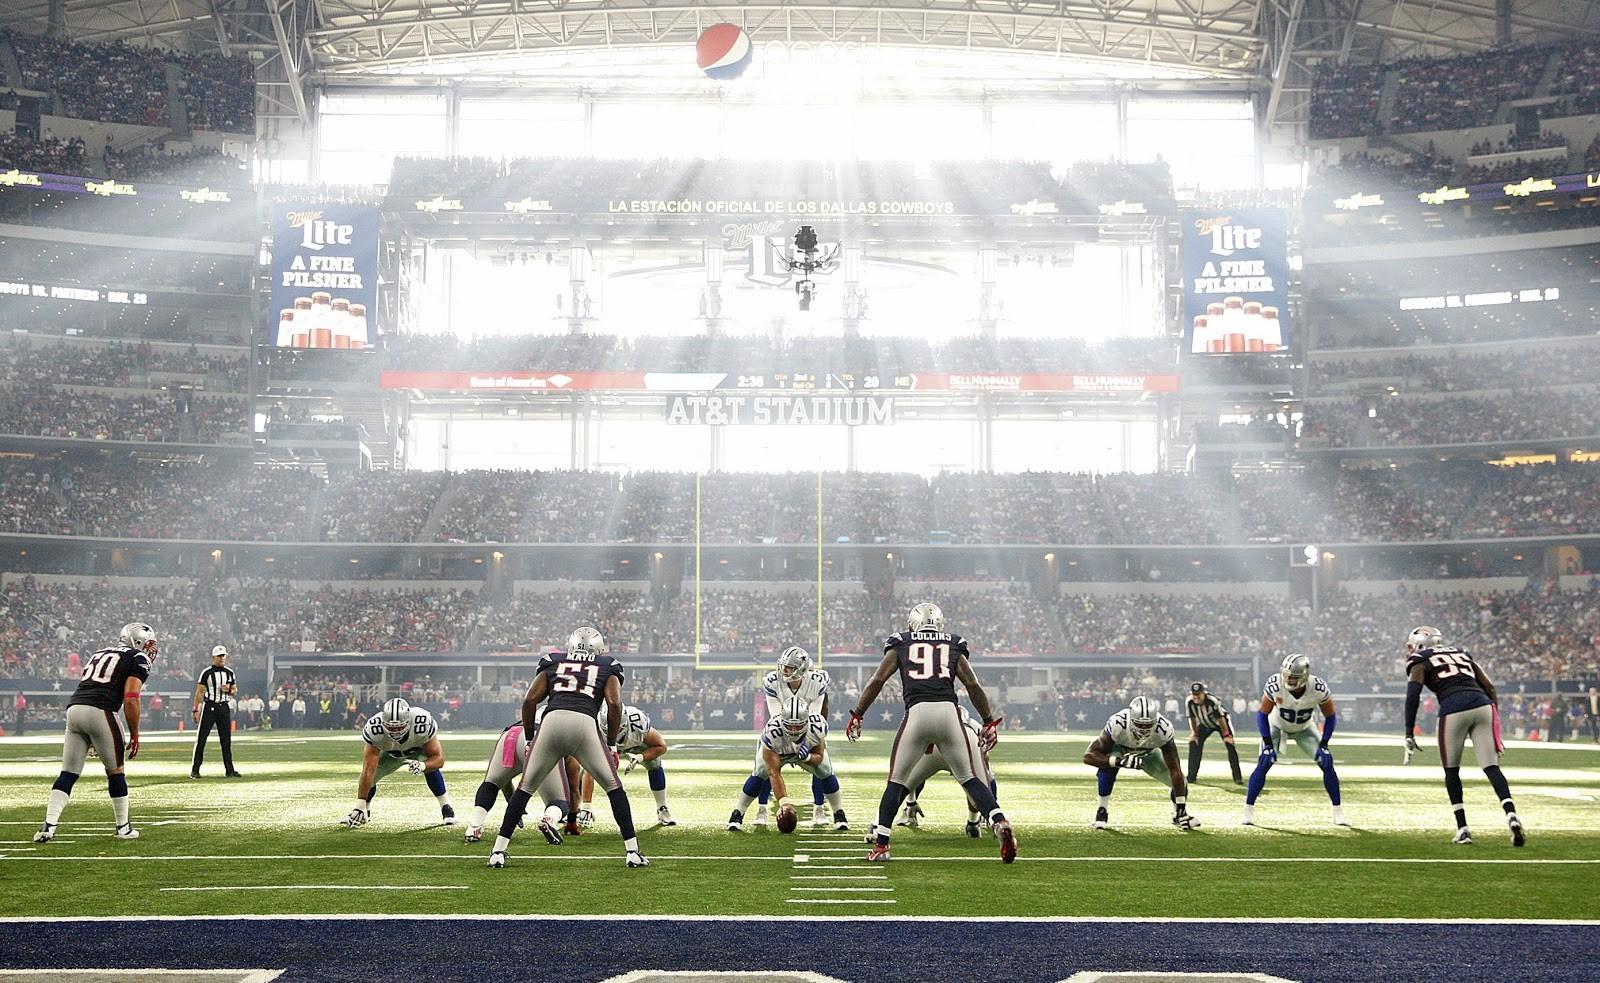 Predicting NFL Plays